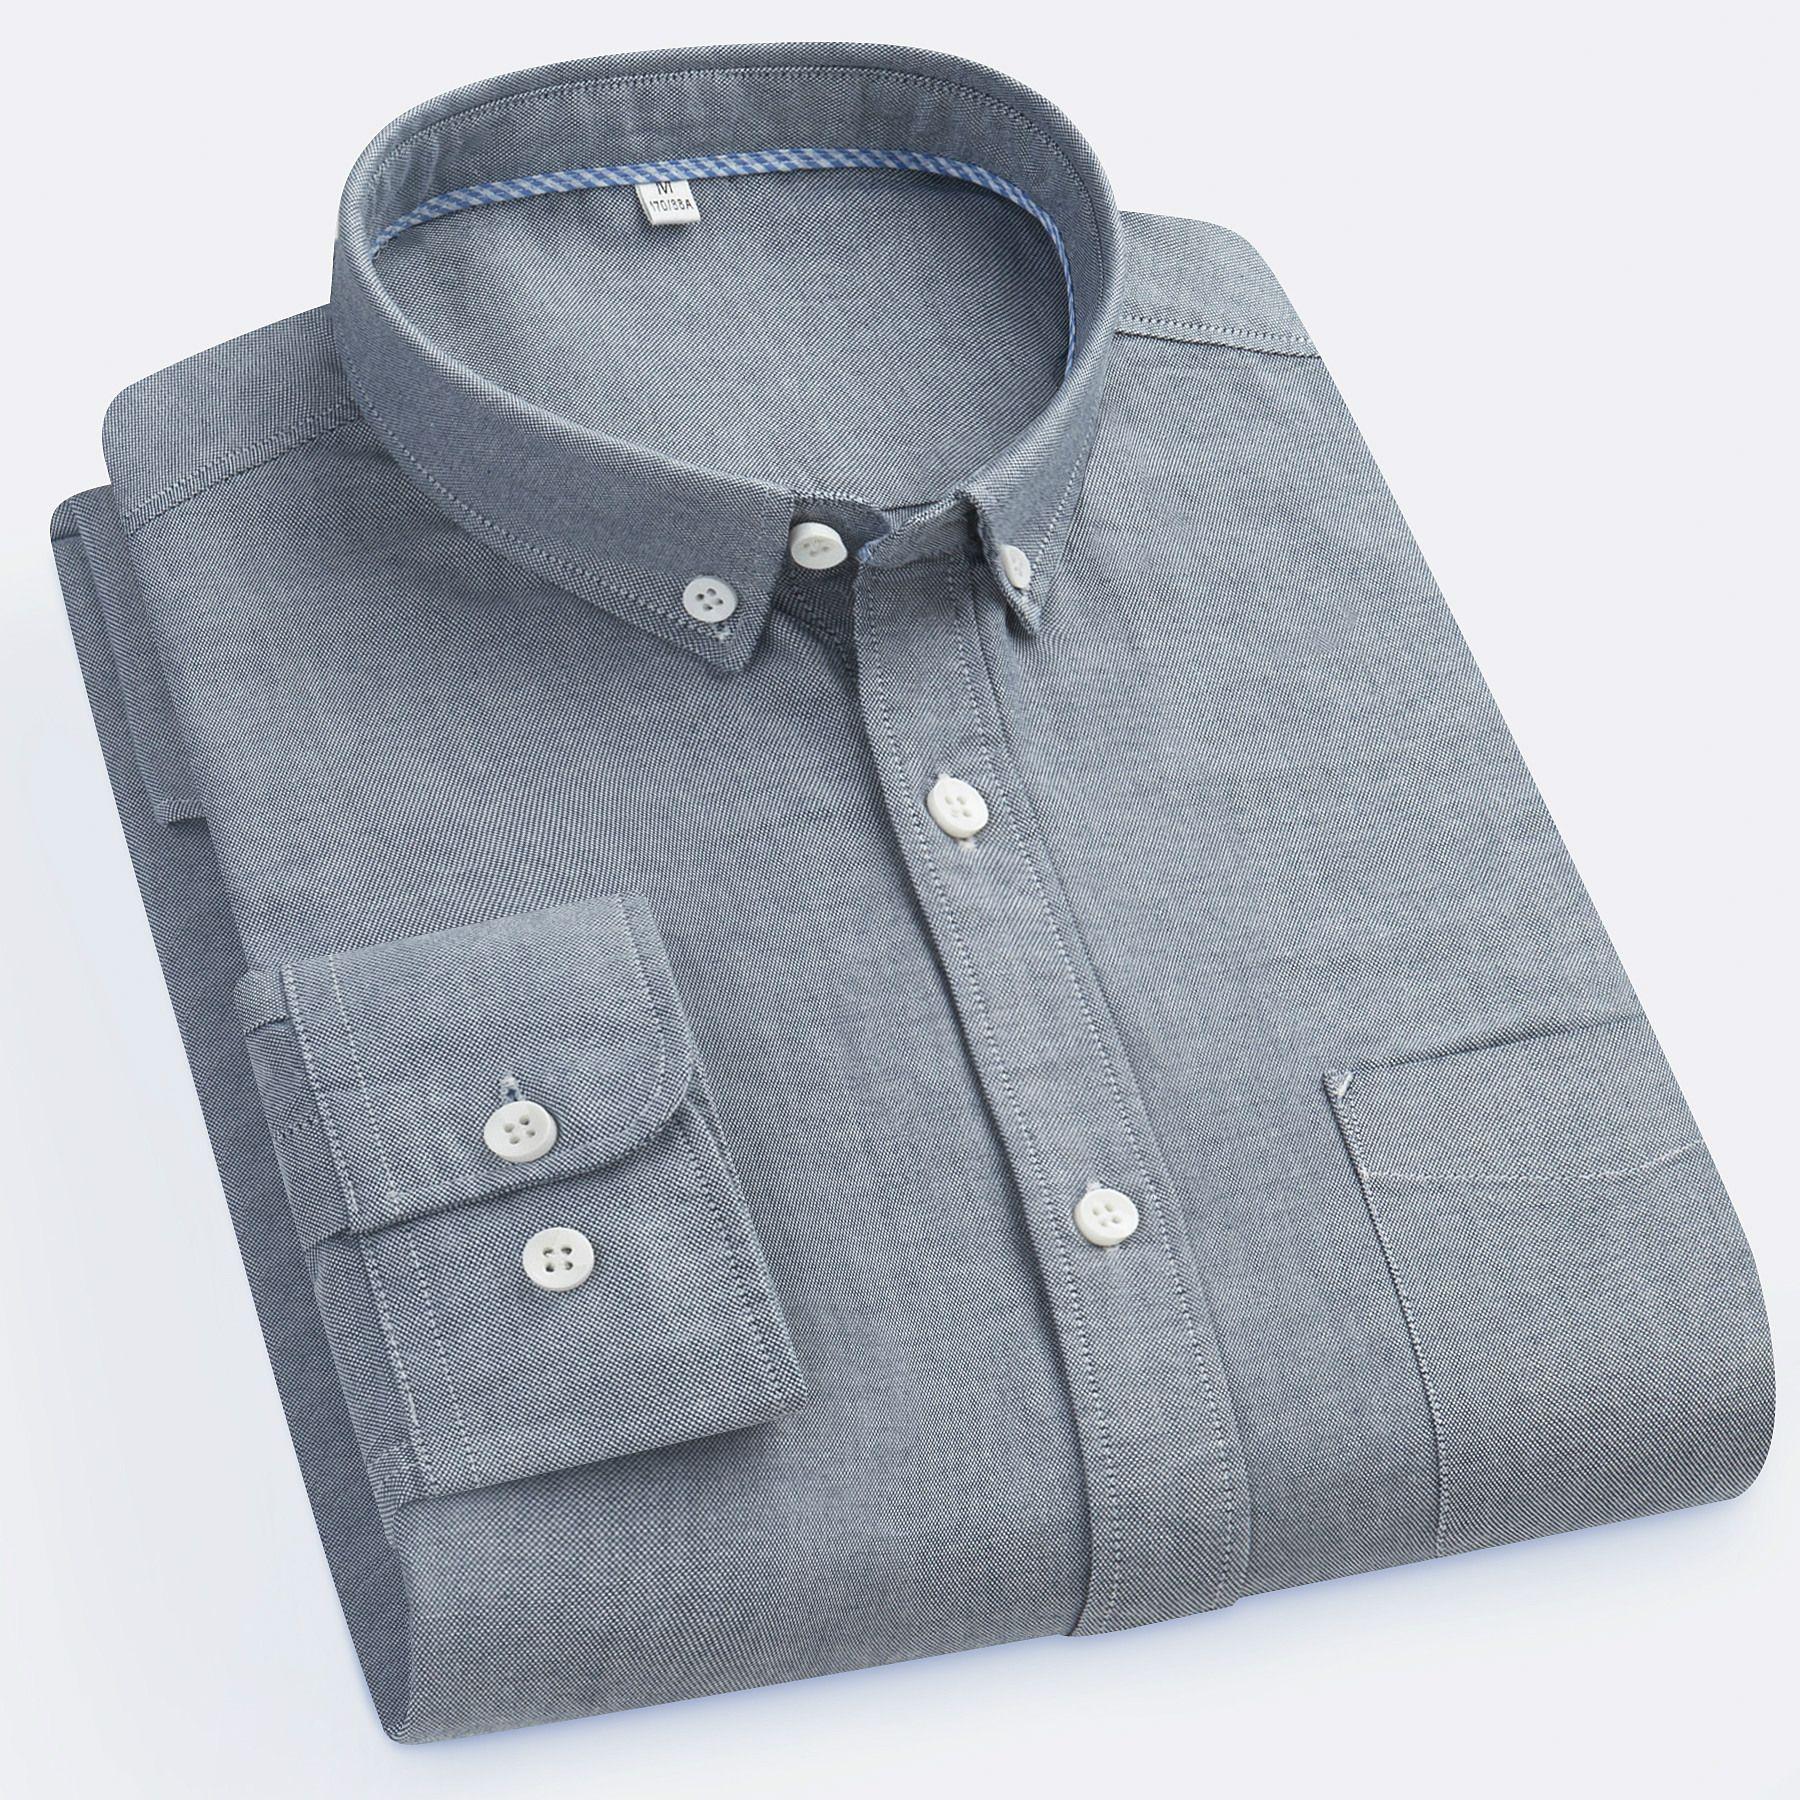 2019 Long Sleeve Plus Size 3XL Men Casual Shirt Male Business Dress Shirt  Men Brand Social Oxford Shirts Blue White From Xunmi,  22.83   DHgate.Com 4943a7c036b